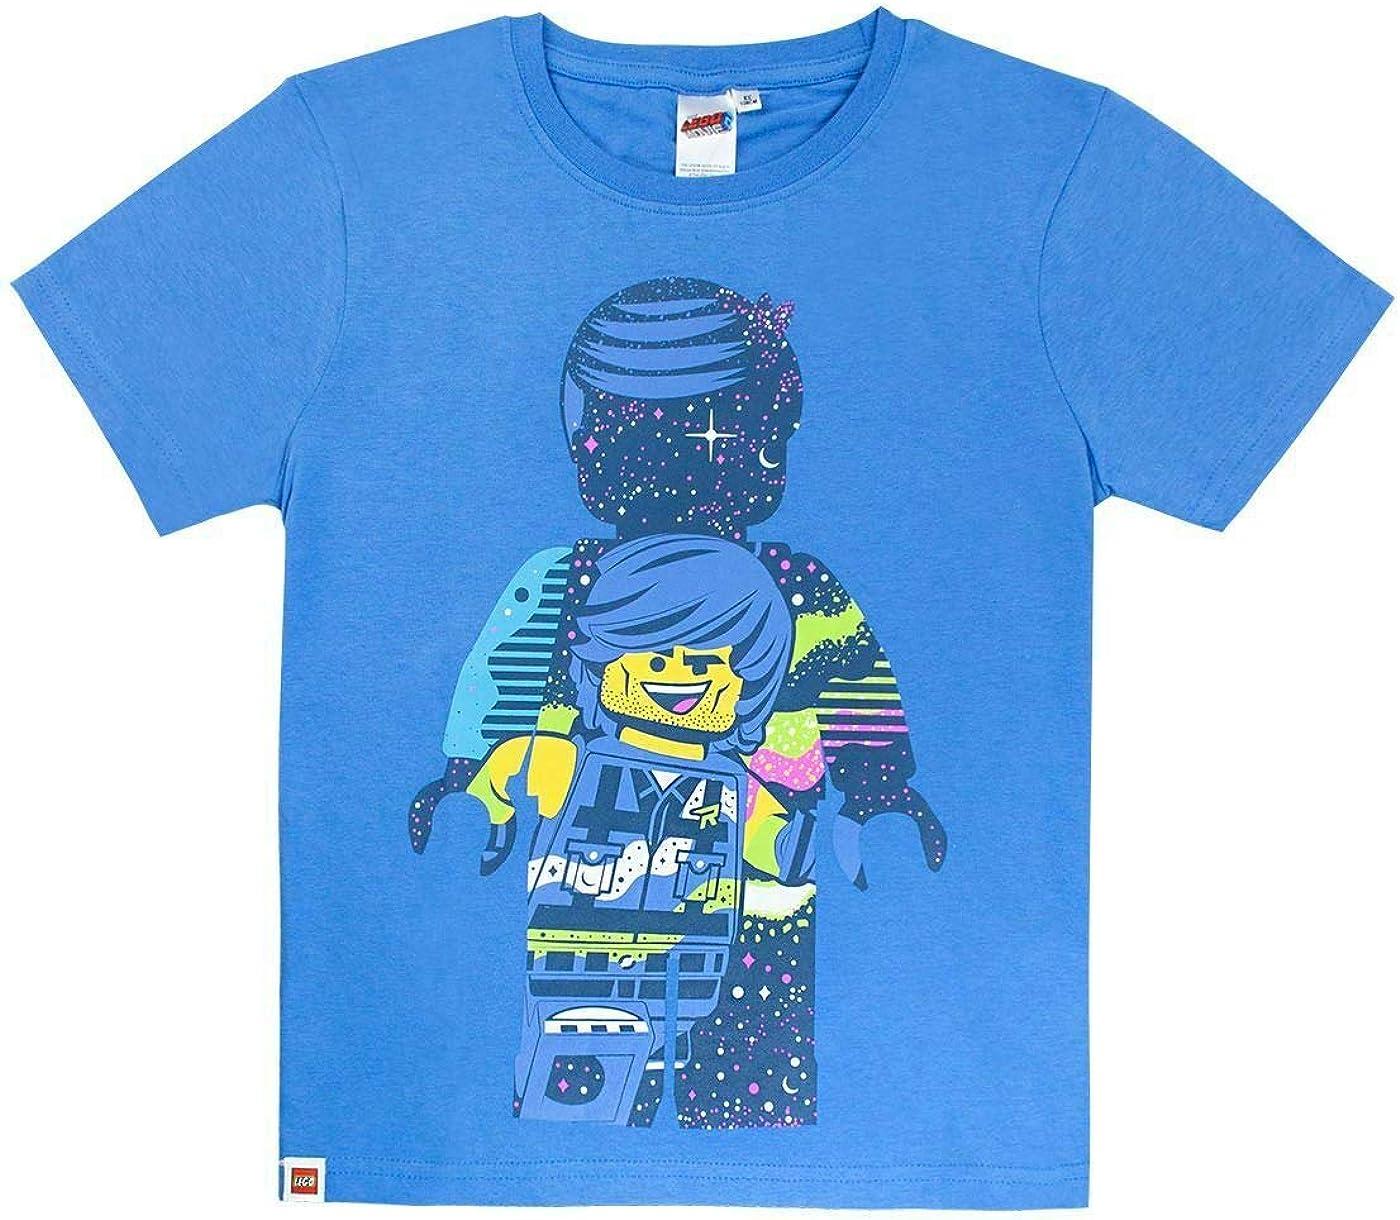 Lego Movie 2 Rex Dangervest Boys Blue Short Sleeve T-Shirt 8 Years